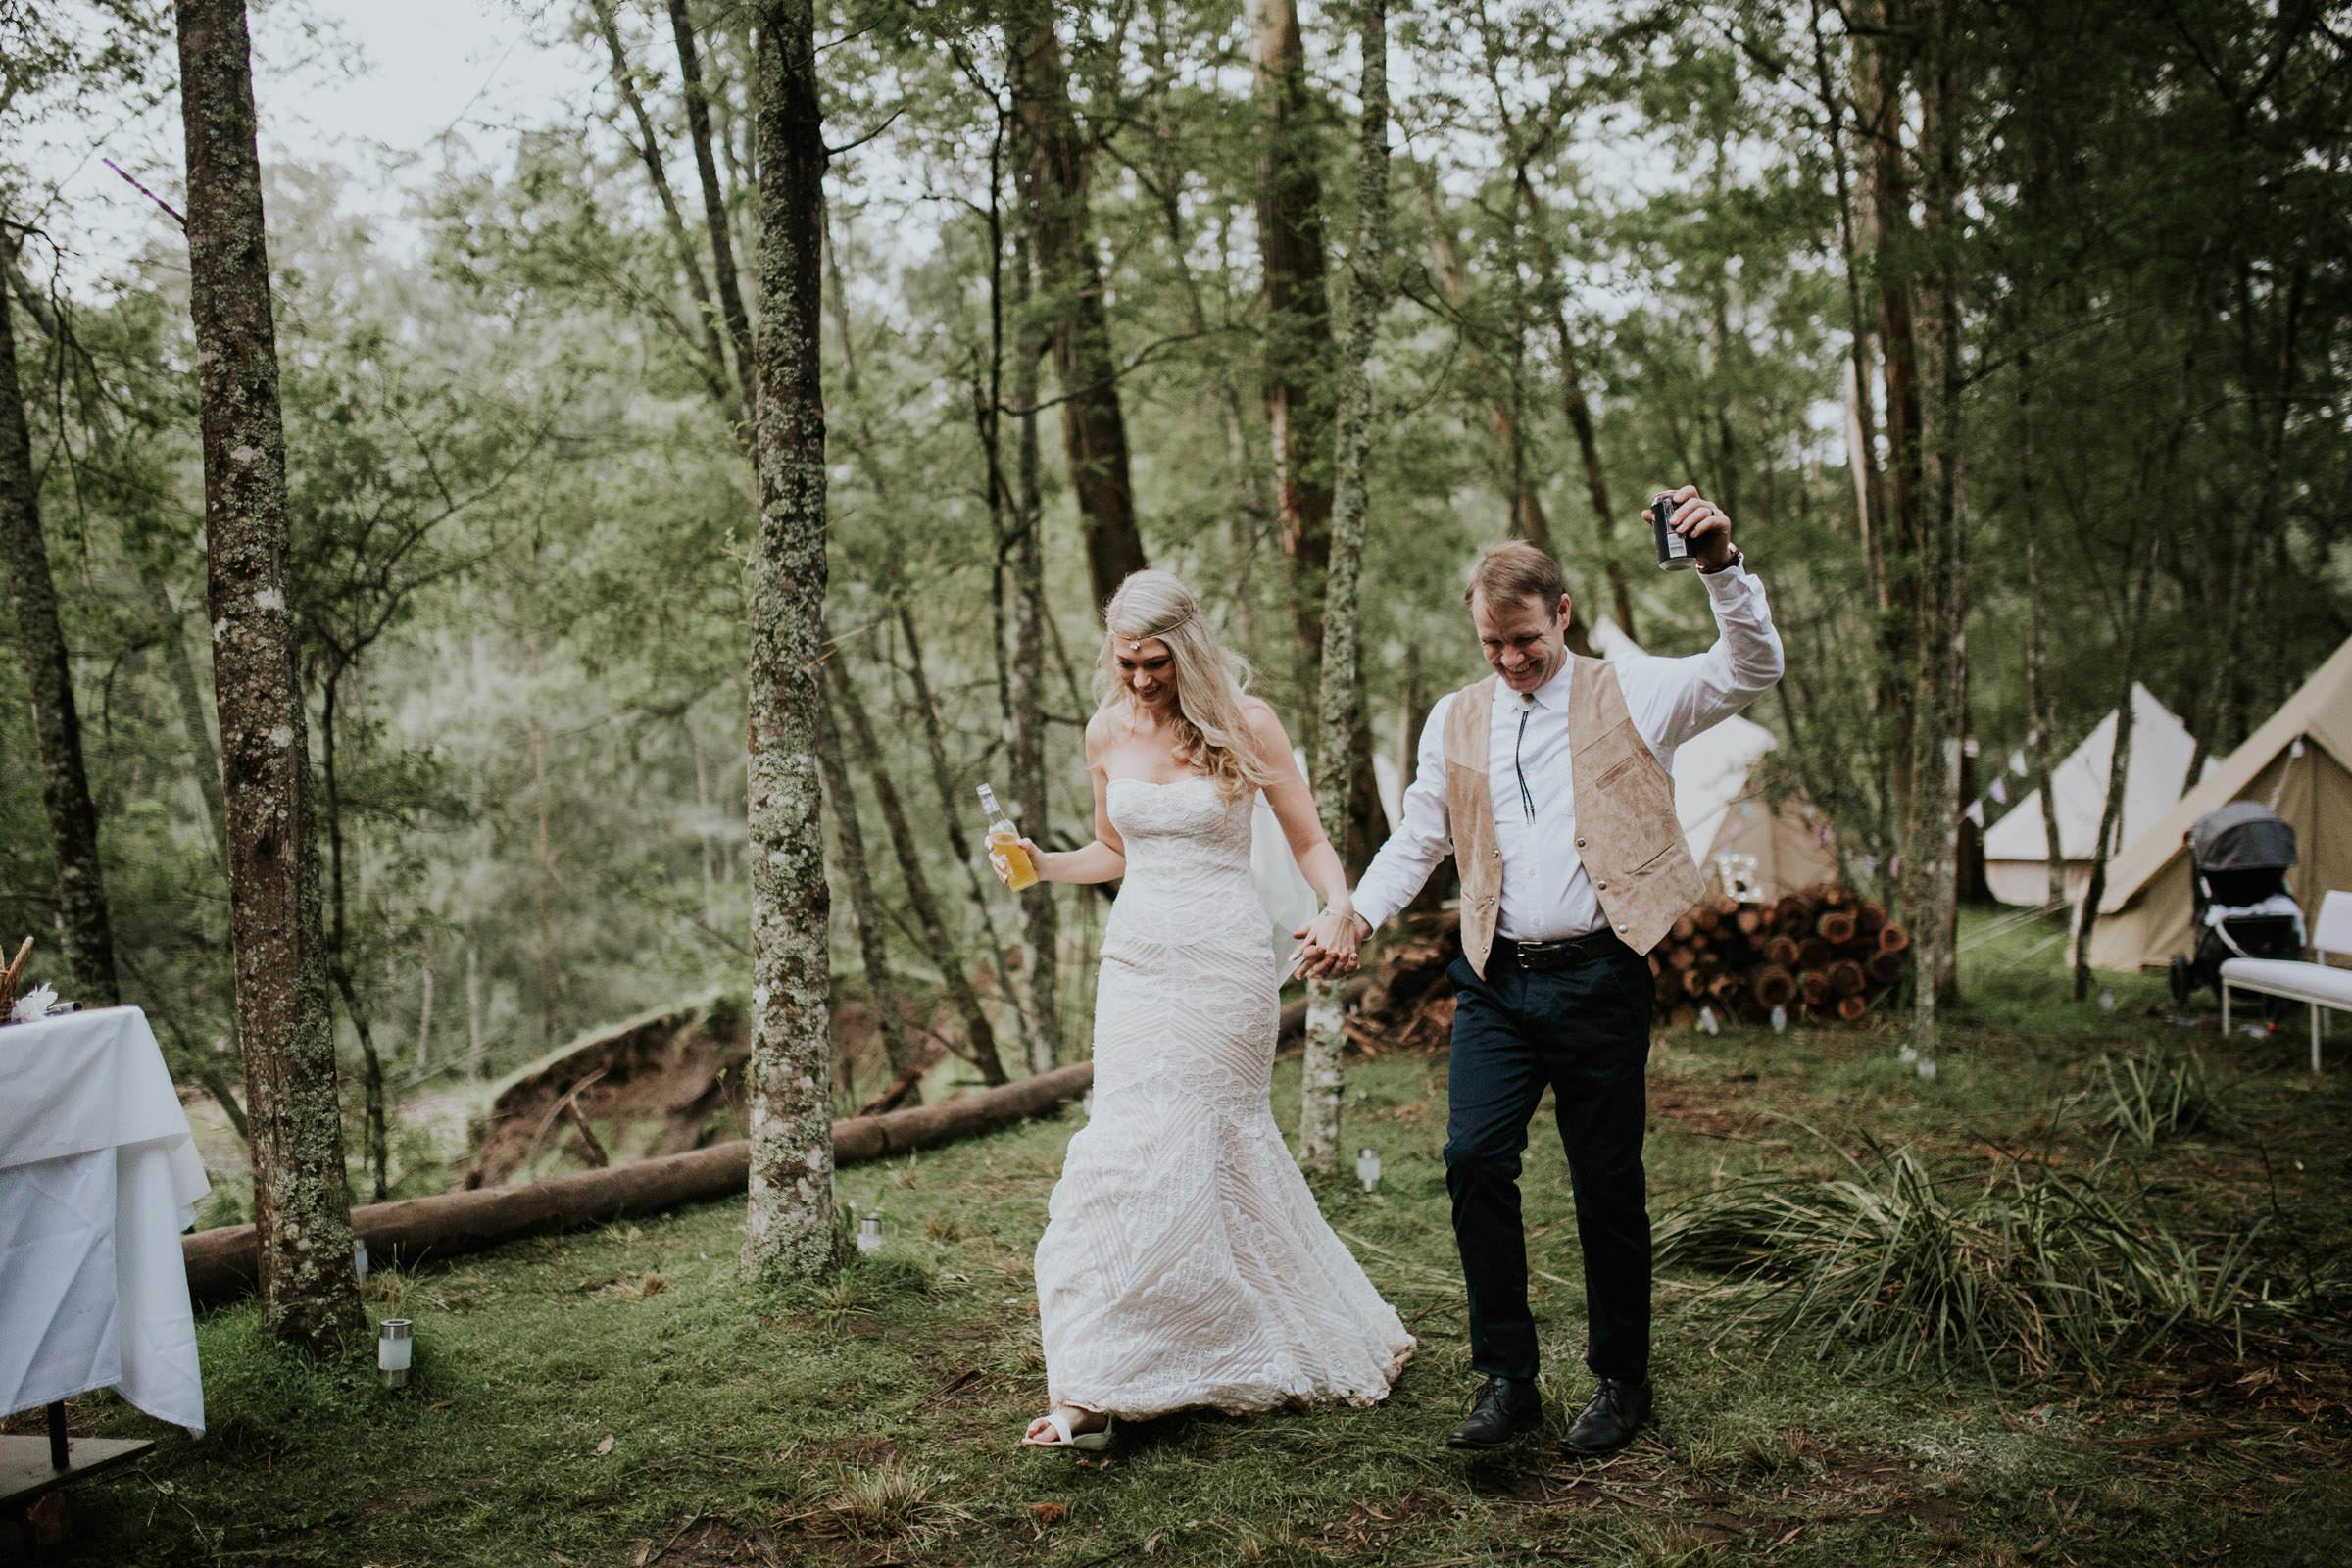 Emma+John+Far+South+Coast+Wedding+Festivl+Glamping+Bush-153.jpg